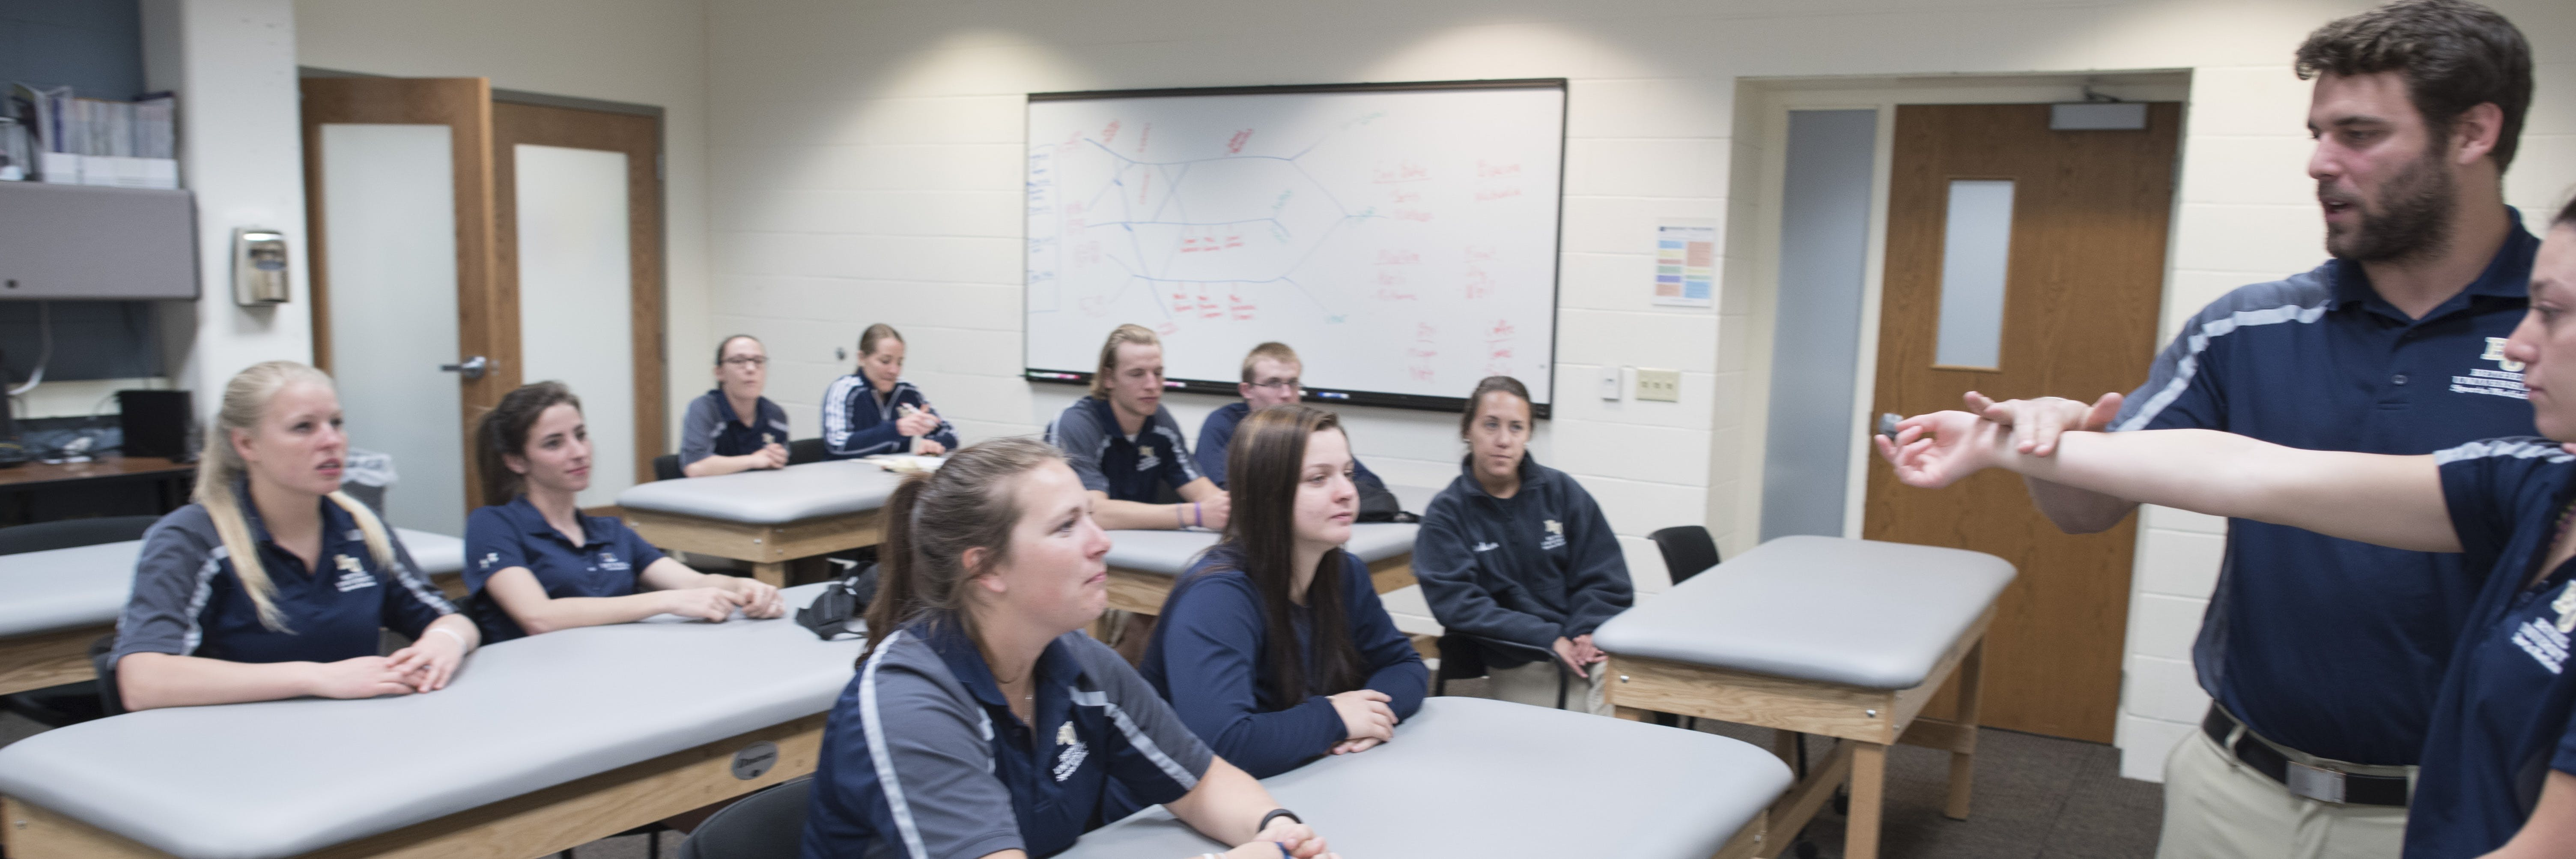 Athletic training leadership program students in classroom